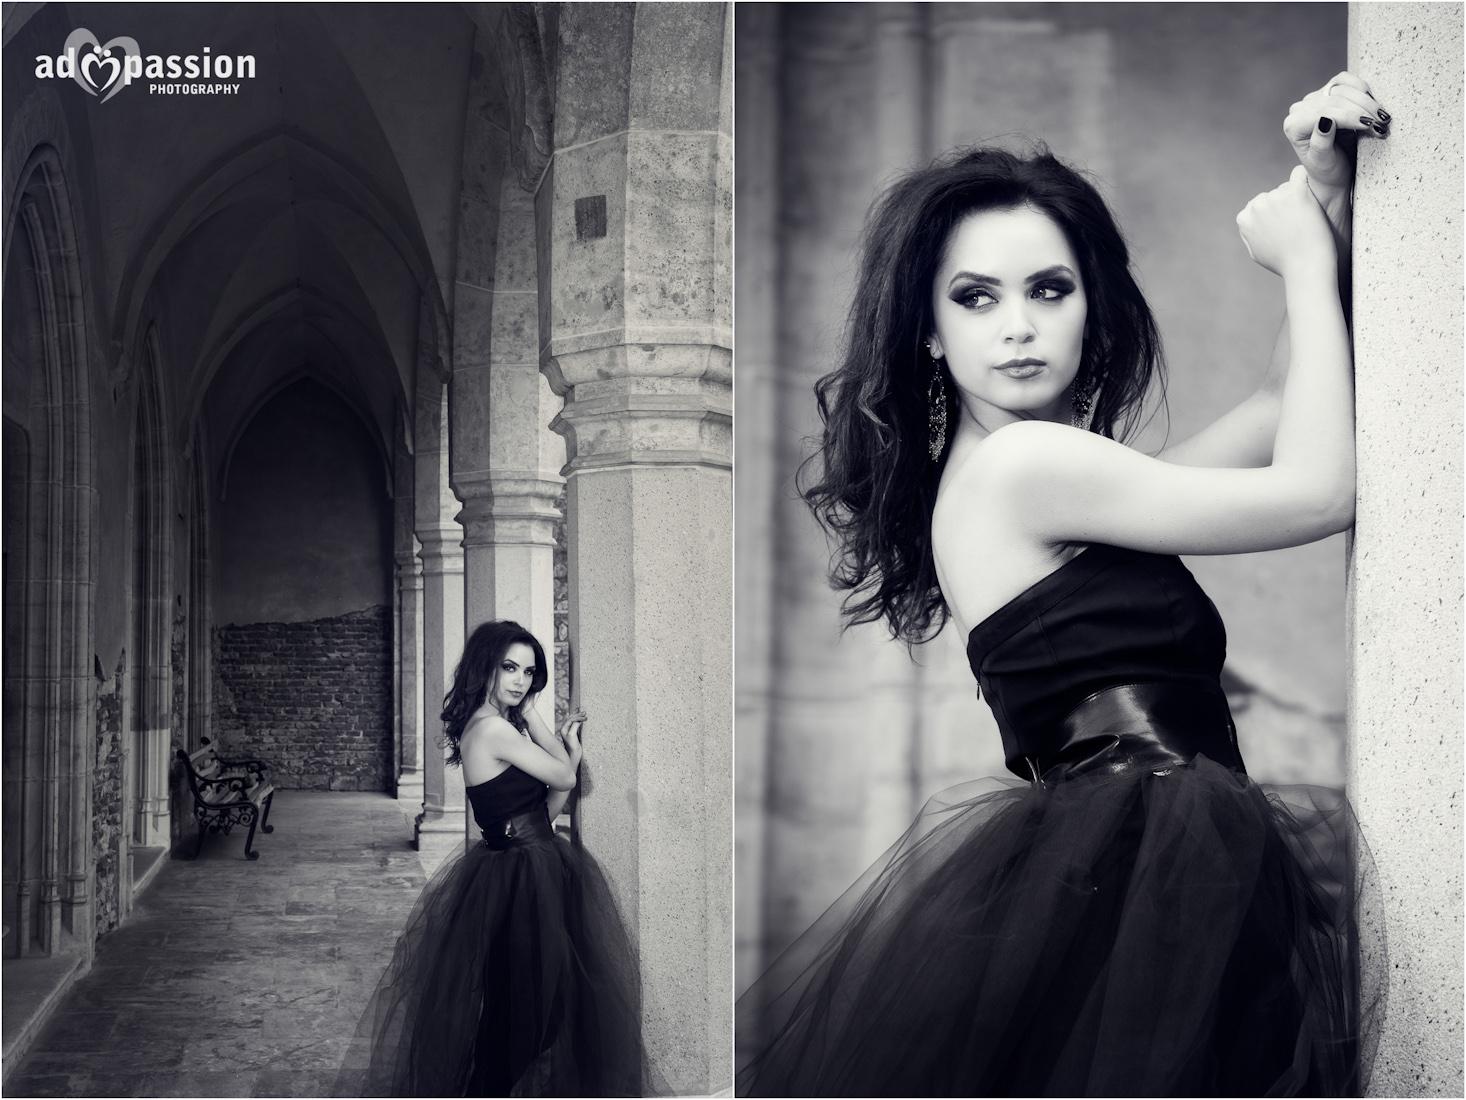 AD Passion Photography | alexandra_castelul_huniazilor_014 | Adelin, Dida, fotograf profesionist, fotograf de nunta, fotografie de nunta, fotograf Timisoara, fotograf Craiova, fotograf Bucuresti, fotograf Arad, nunta Timisoara, nunta Arad, nunta Bucuresti, nunta Craiova